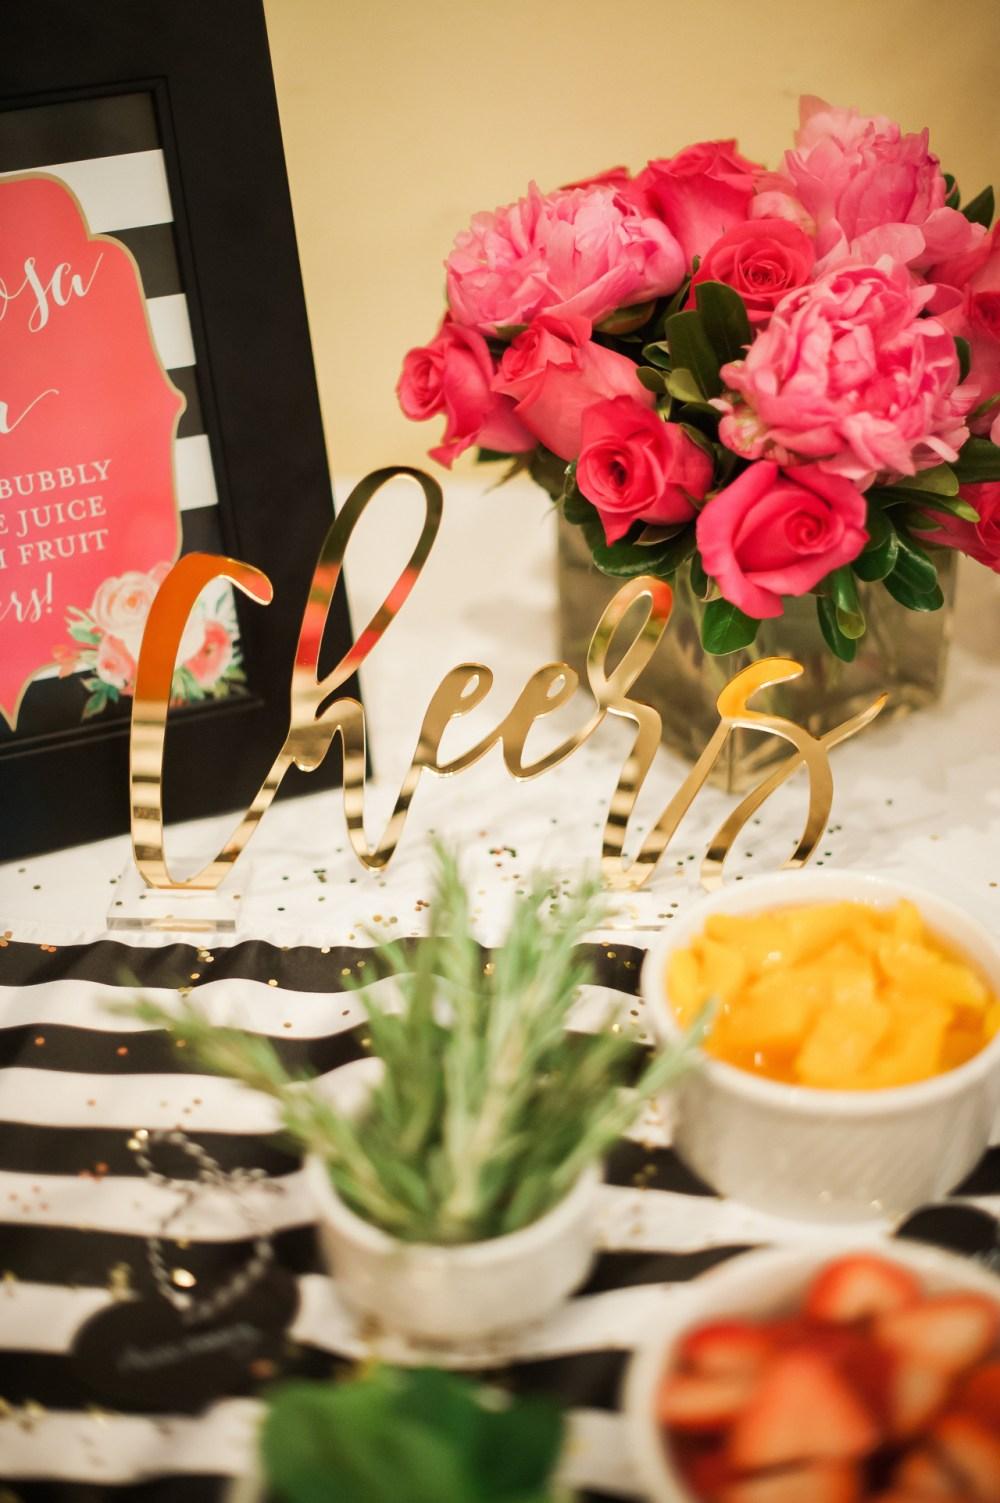 Cheers Acrylic Sign Moon & Lola Fancy Things Kate Spade Bridal Shower